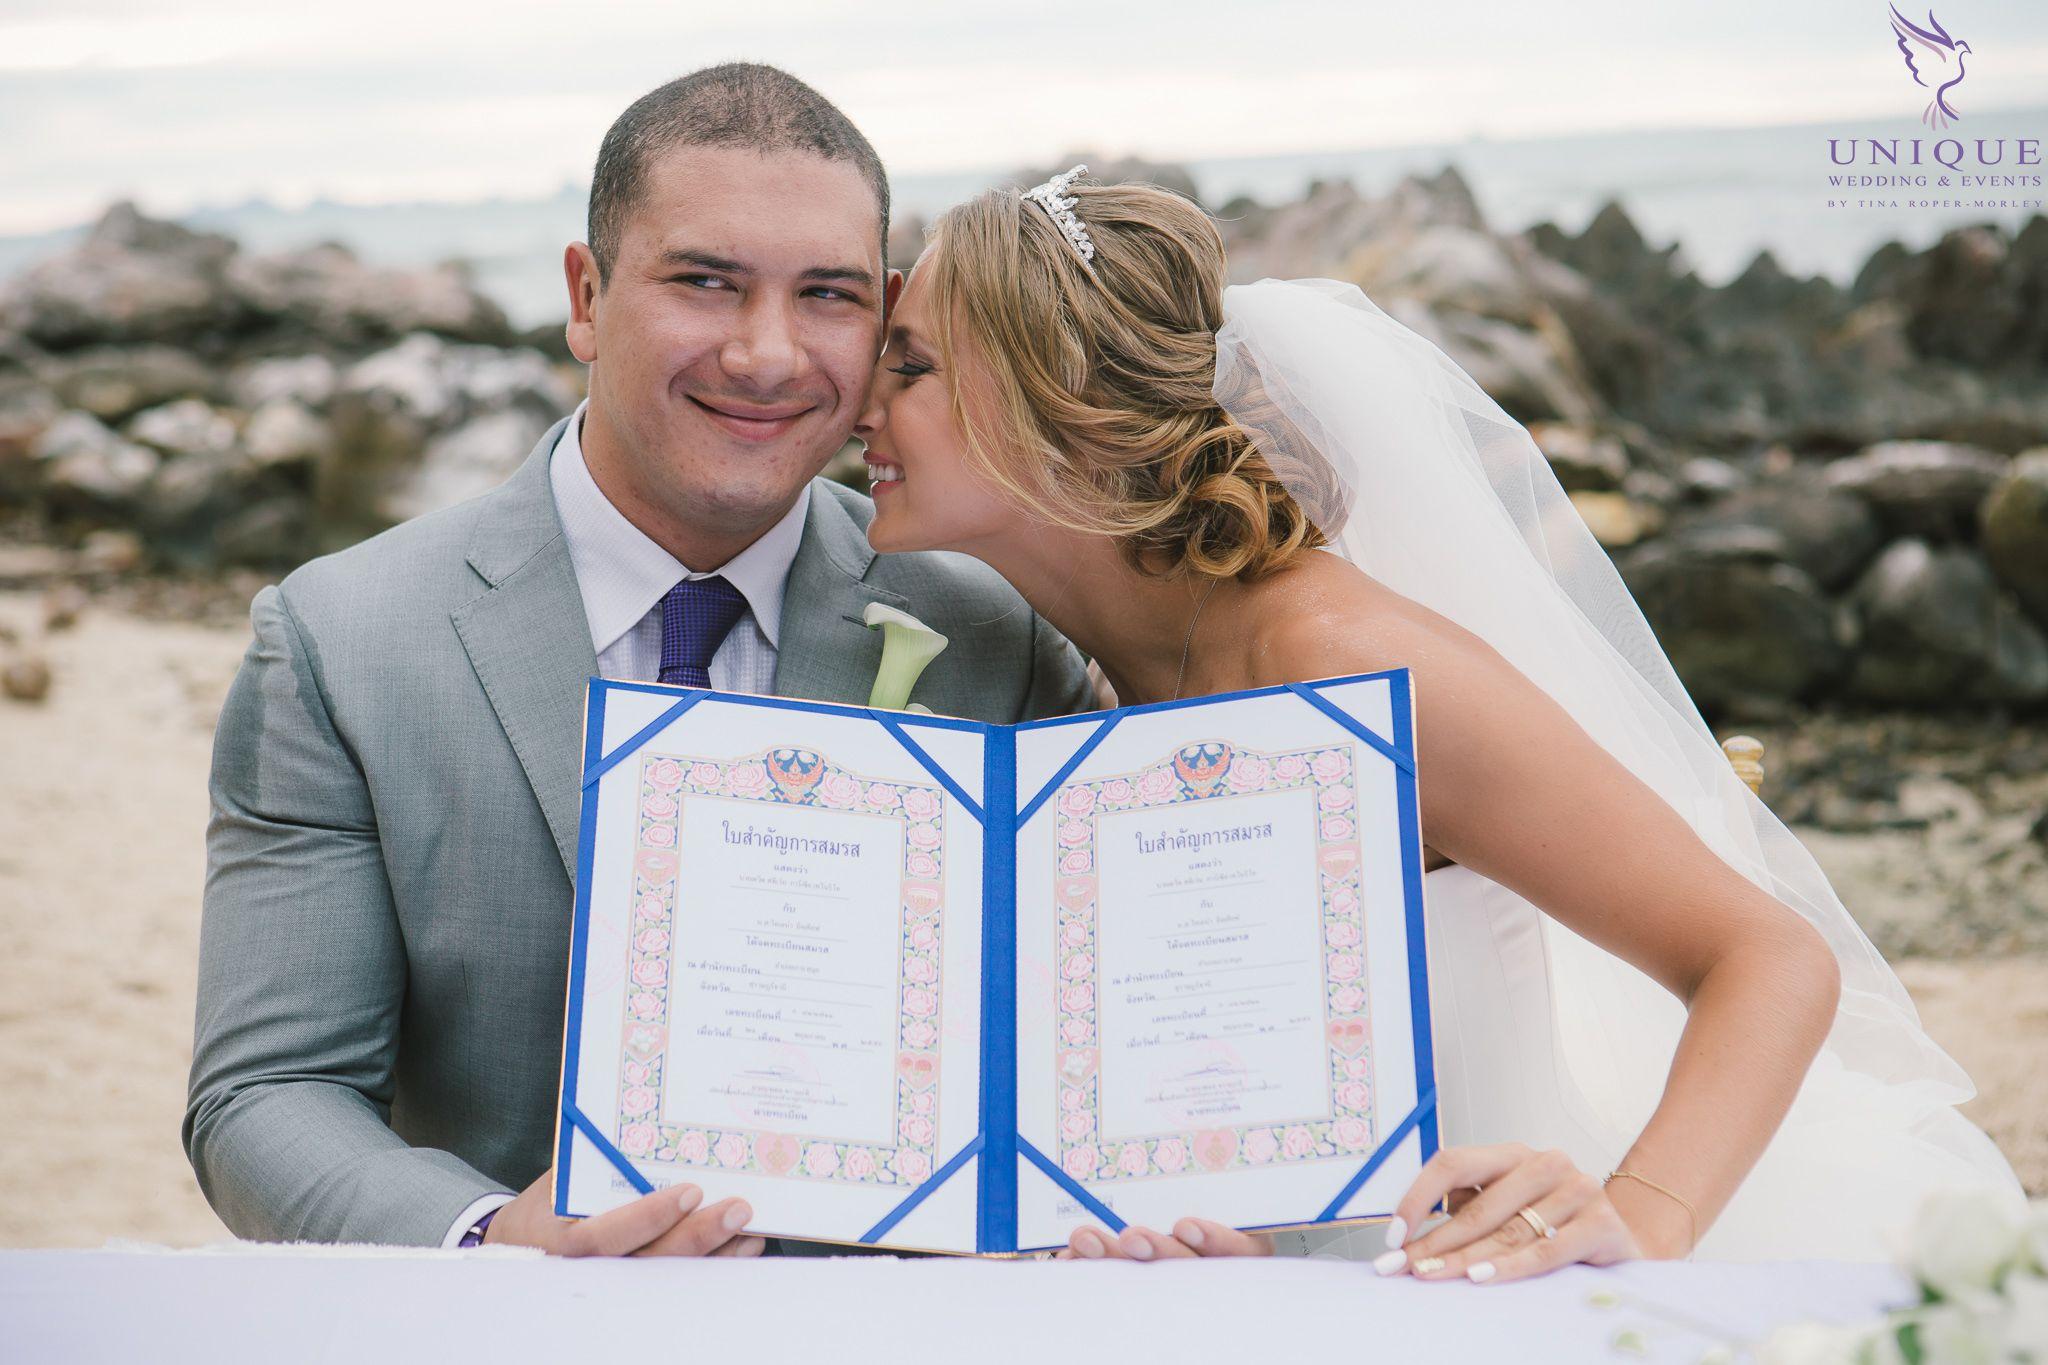 The legal wedding in Thailand